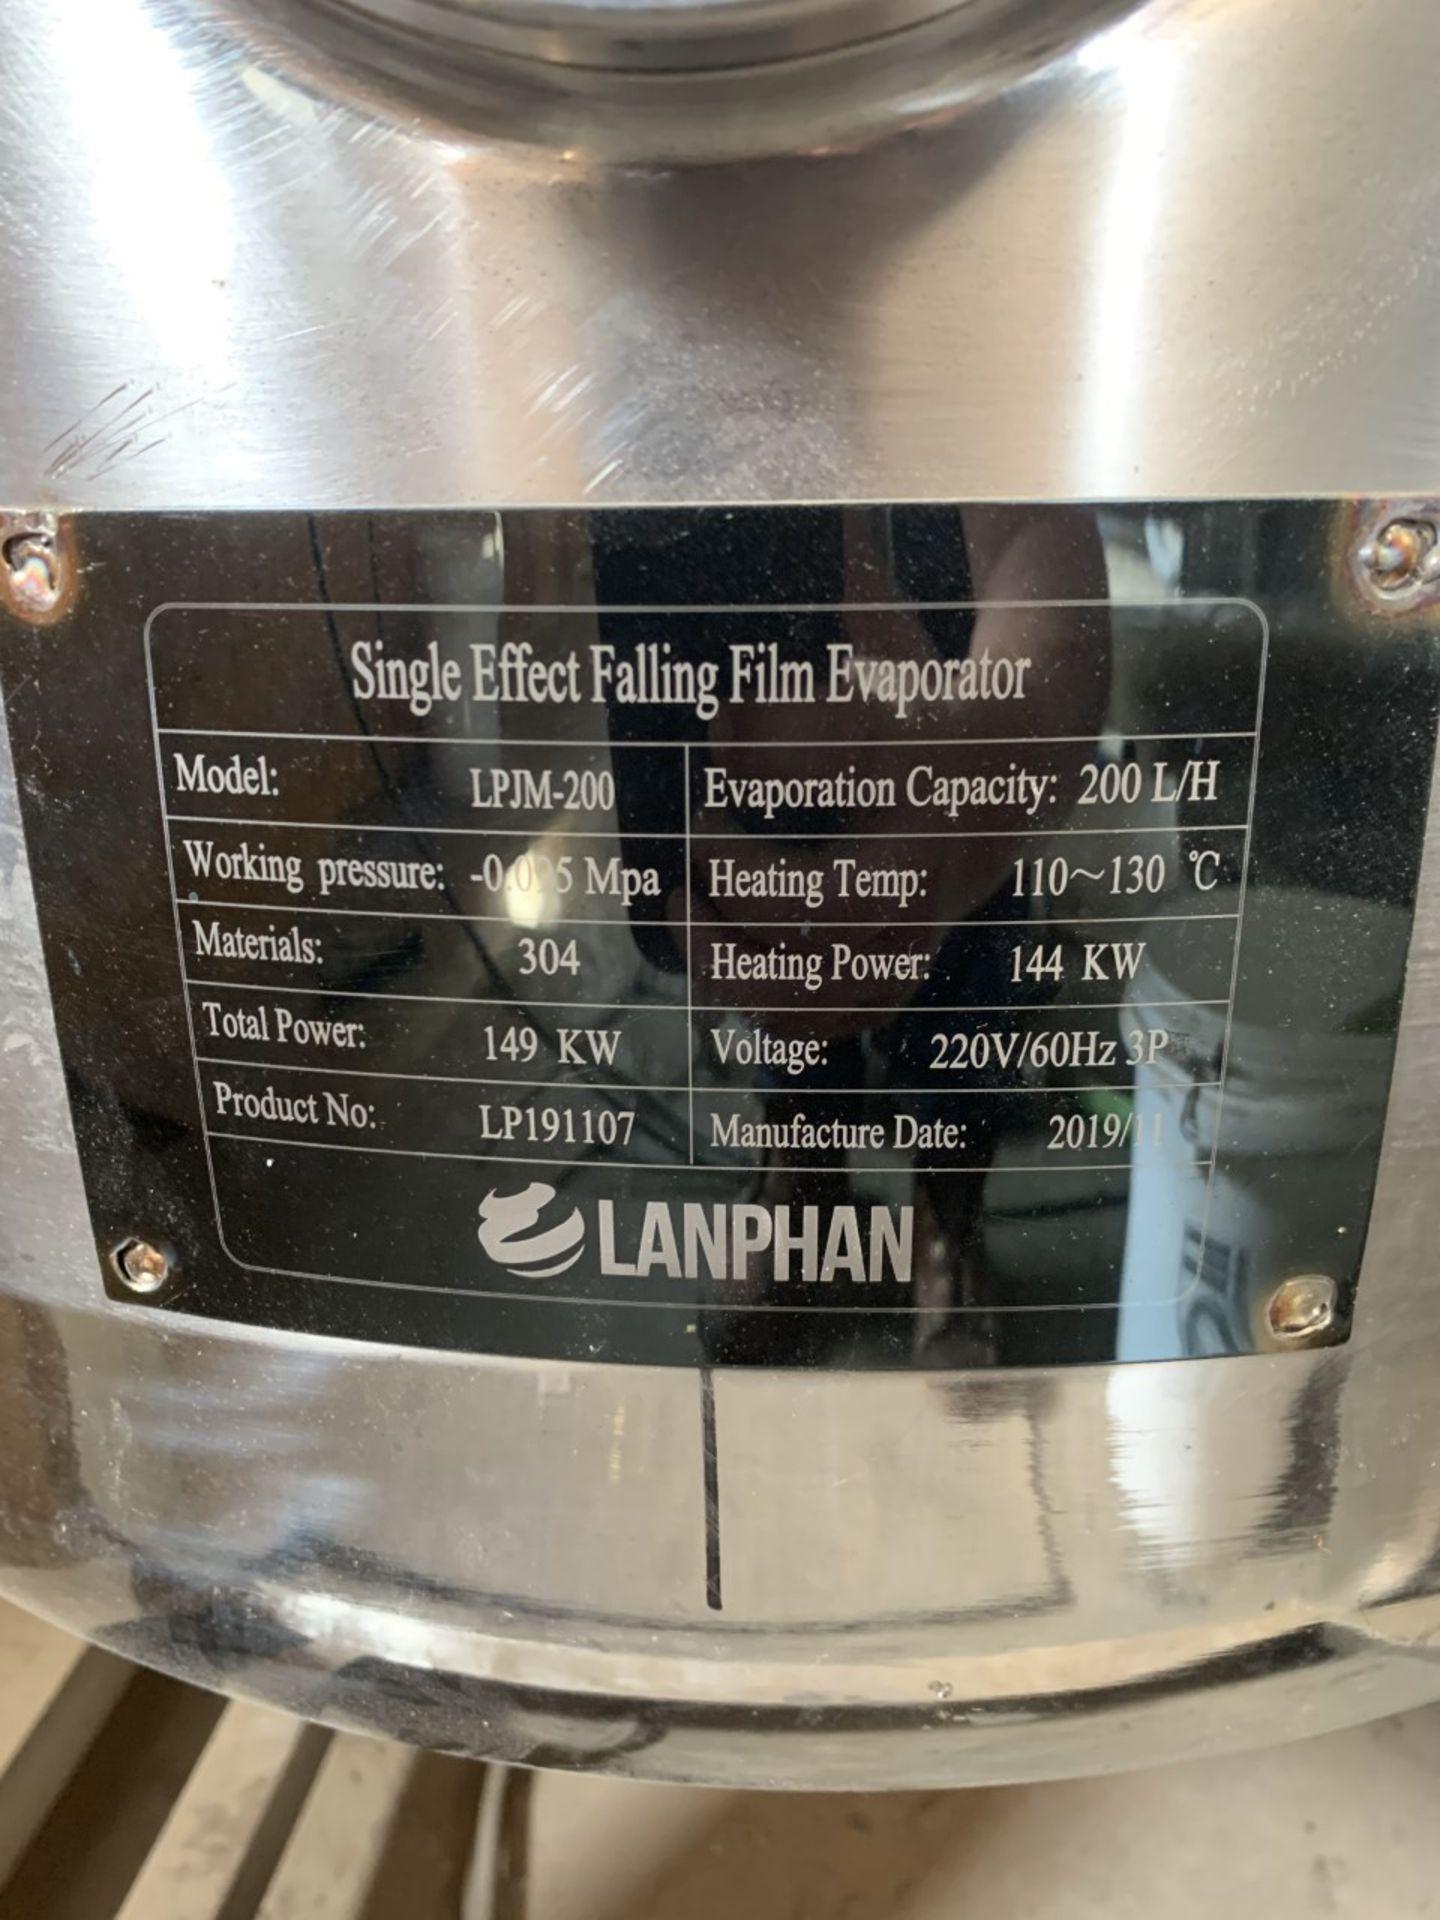 Used Henan Lanphan Industry Single-Effect Falling Film Evaporator. Model FFE-200. Capacity: 200 L/hr - Image 3 of 3